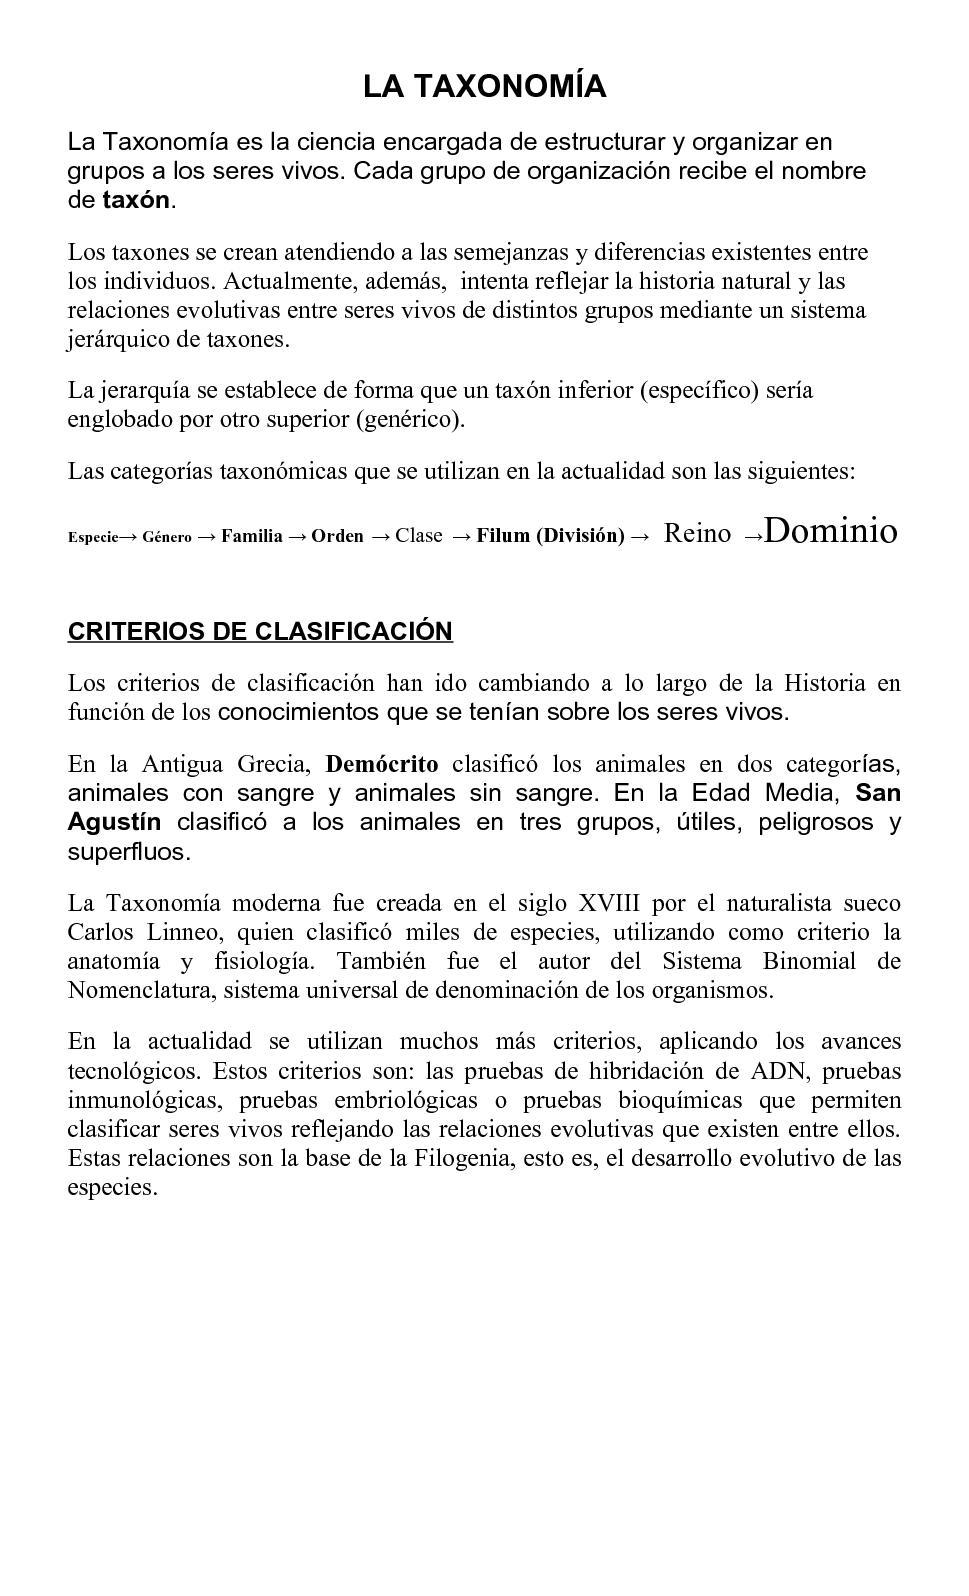 Calaméo - La Taxonomia